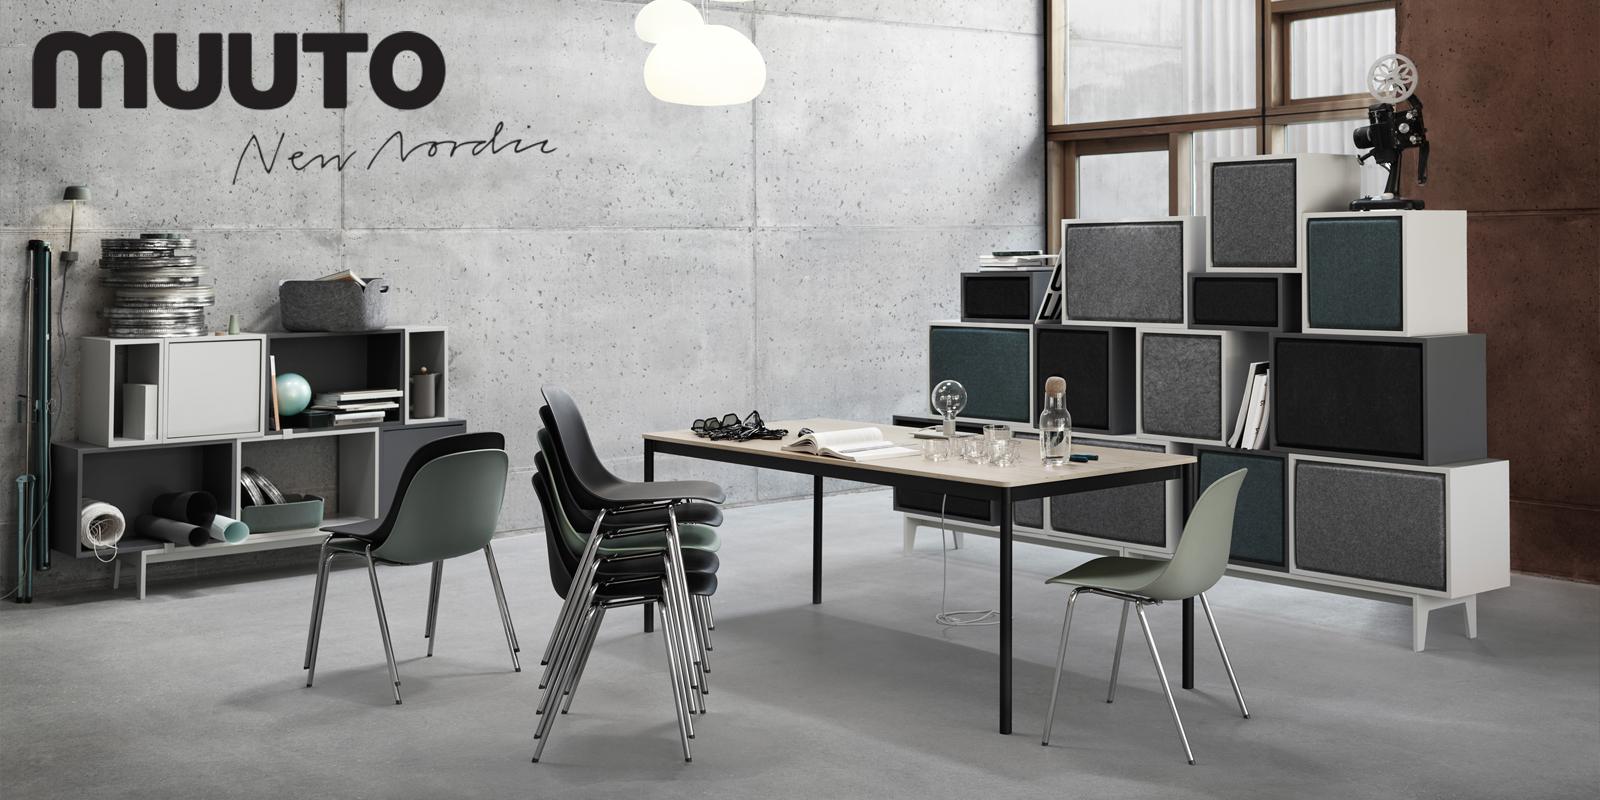 Muuto Furniture